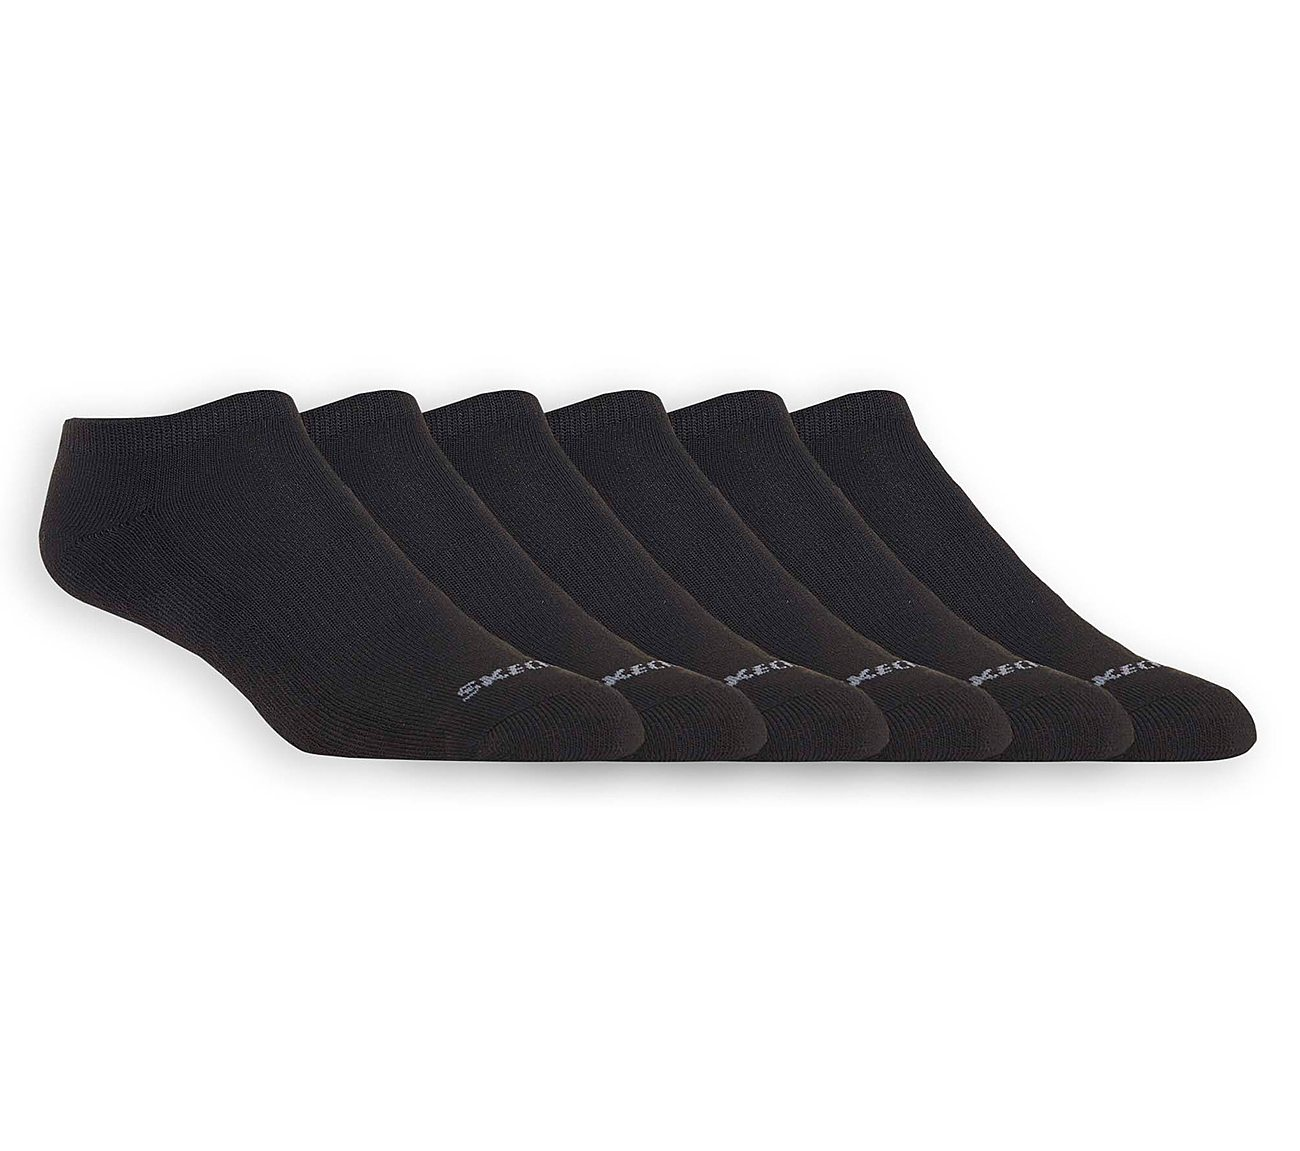 6 Pack Half Terry Socks